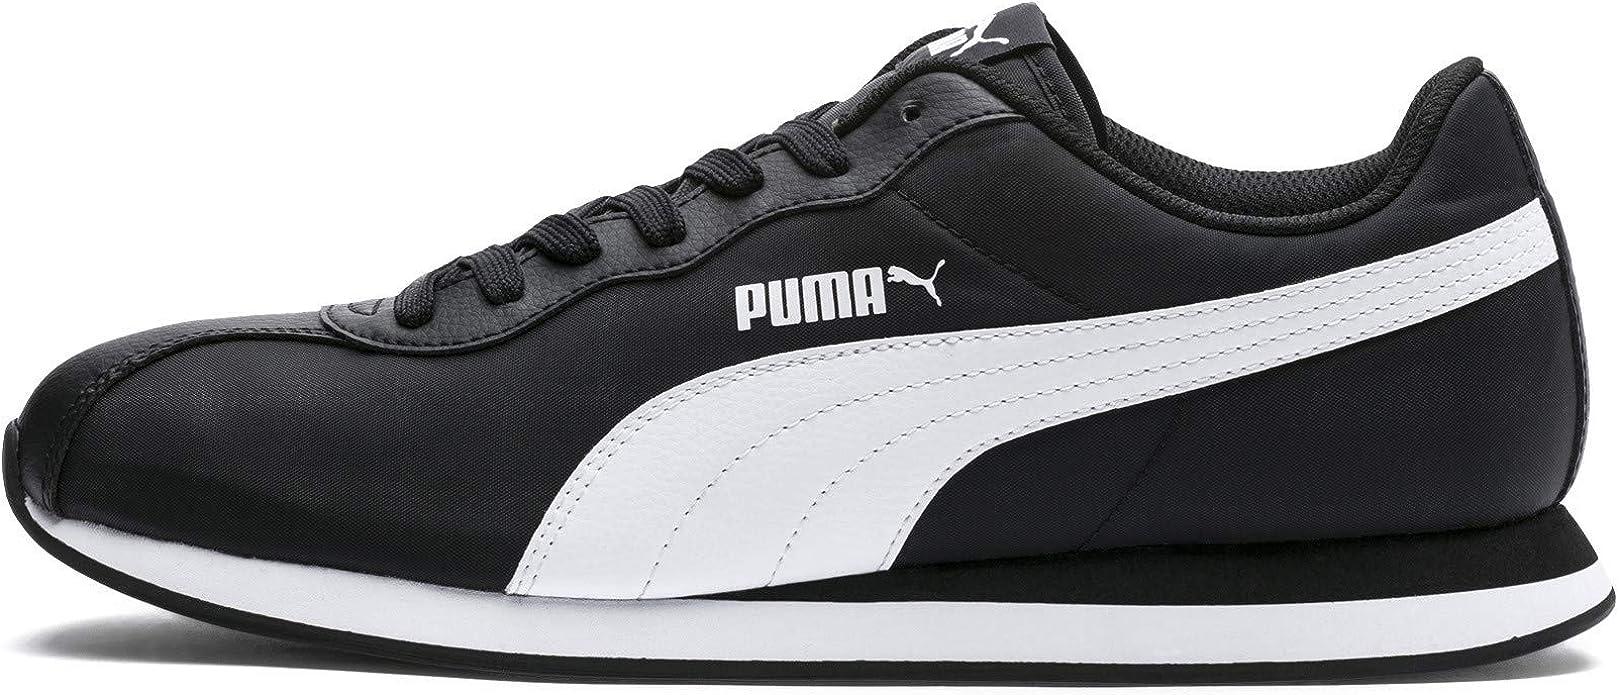 PUMA Unisex Adults Turin II NL Trainer